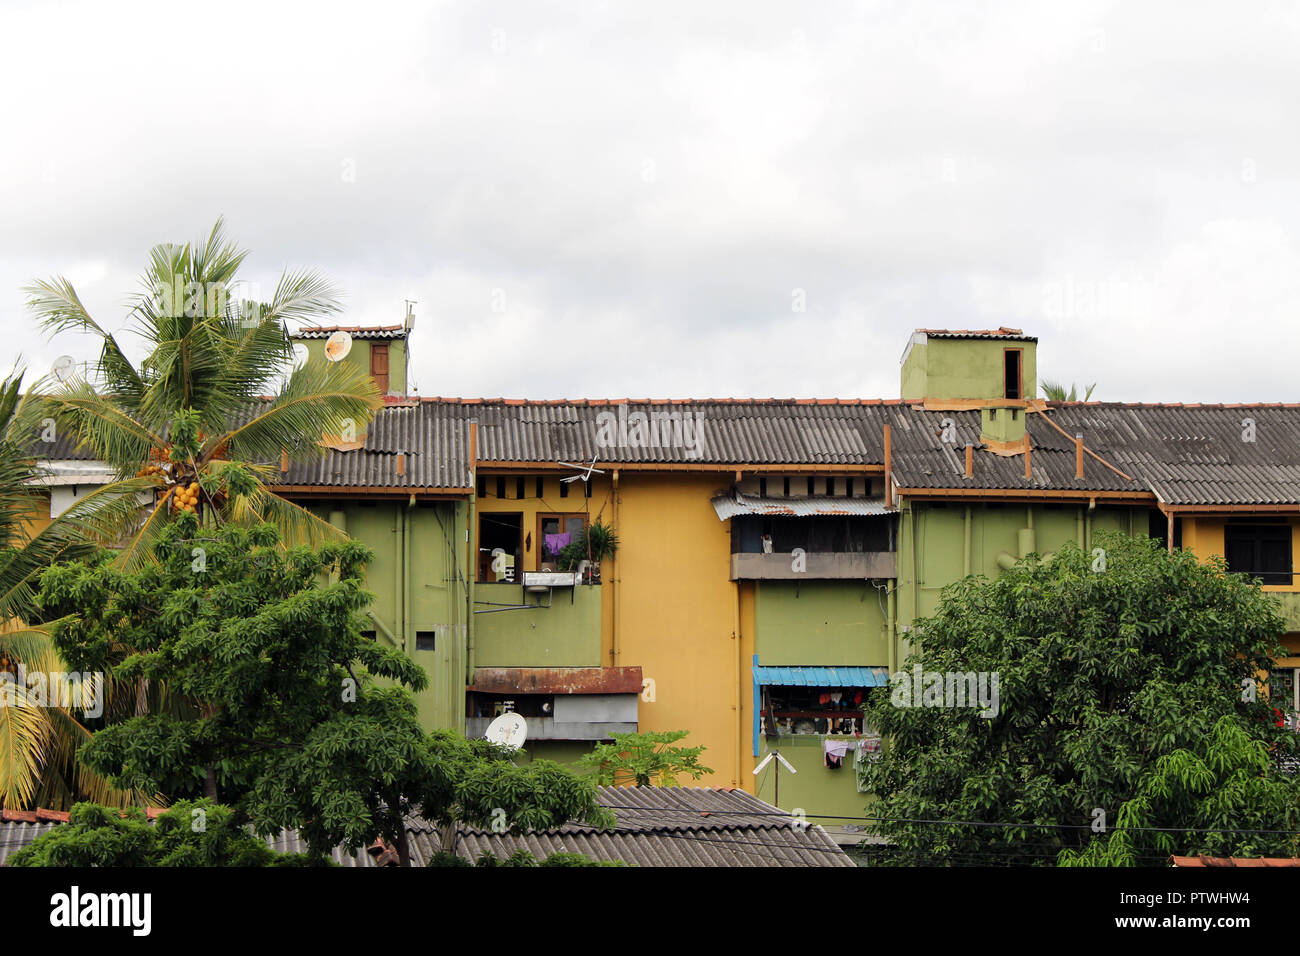 The stacks of housing area in colombo taken in sri lanka august 2018